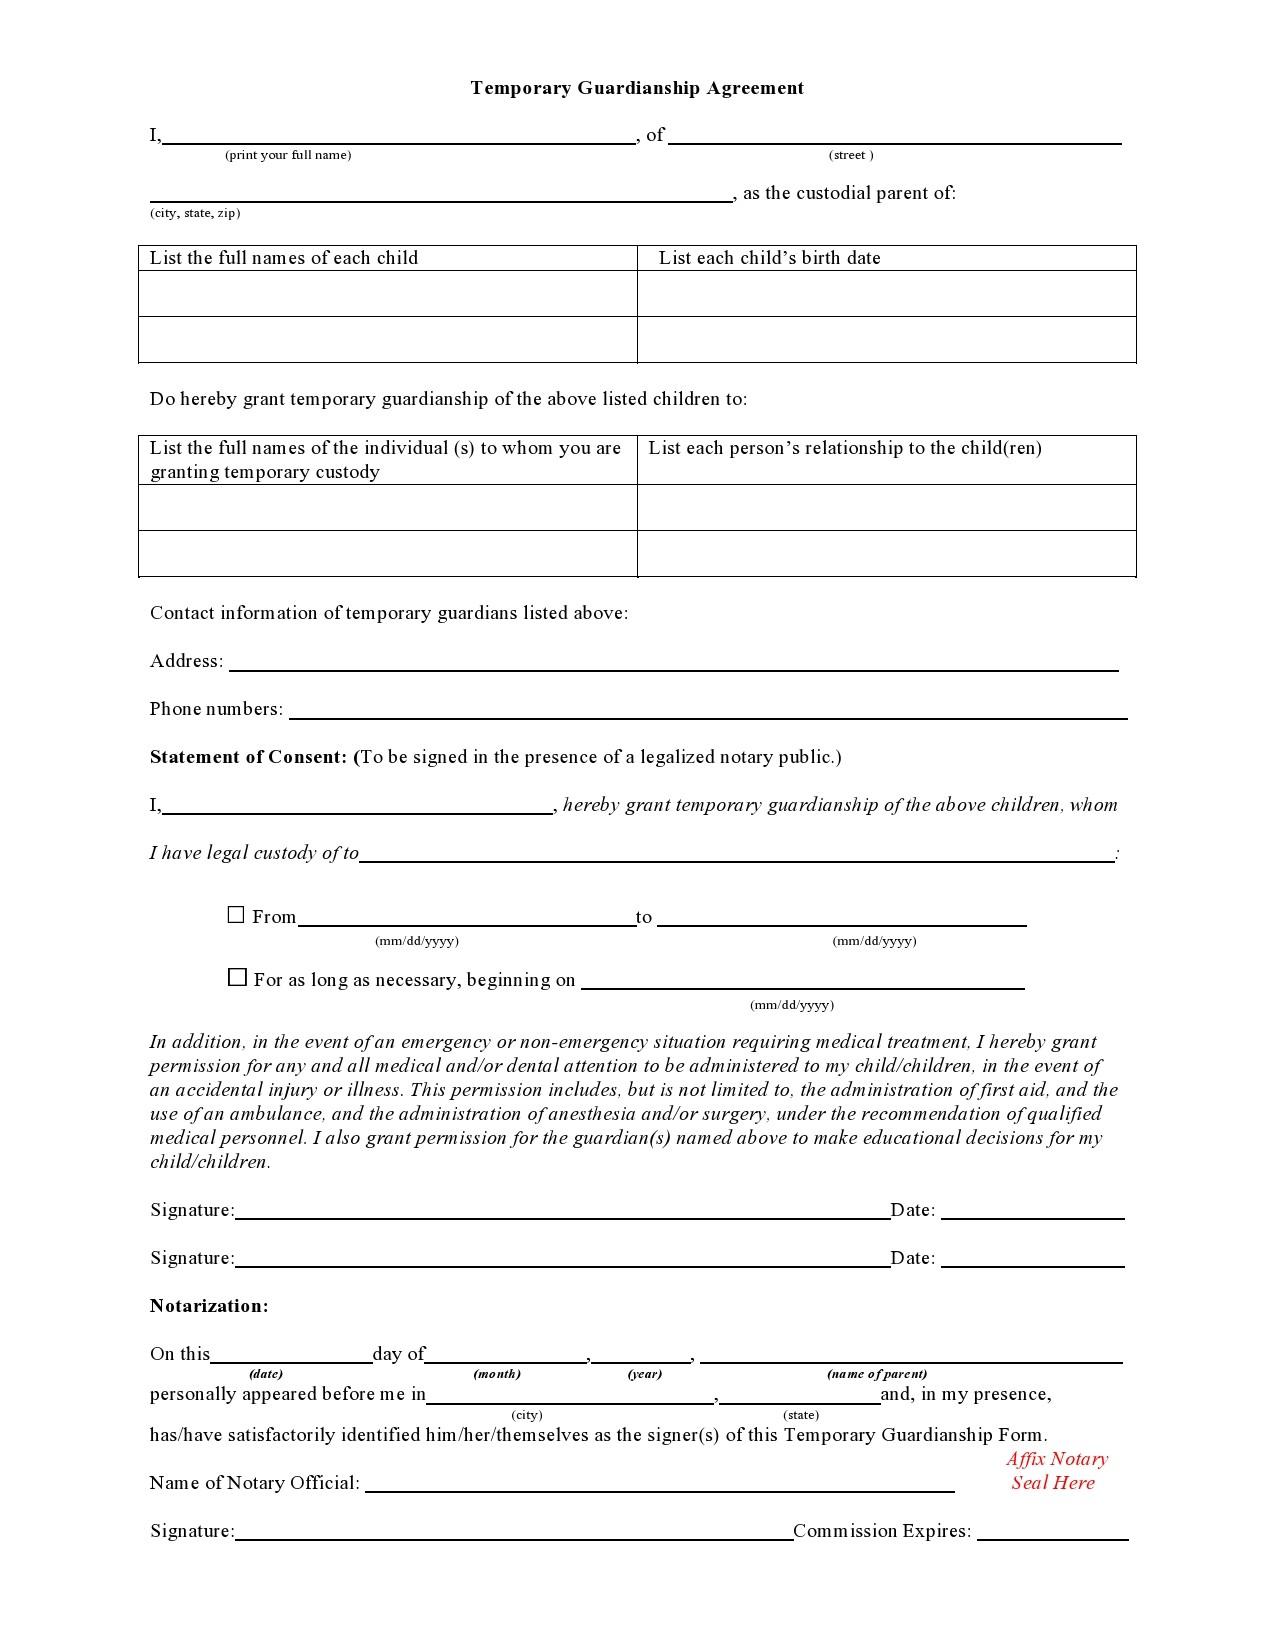 Free temporary guardianship form 22